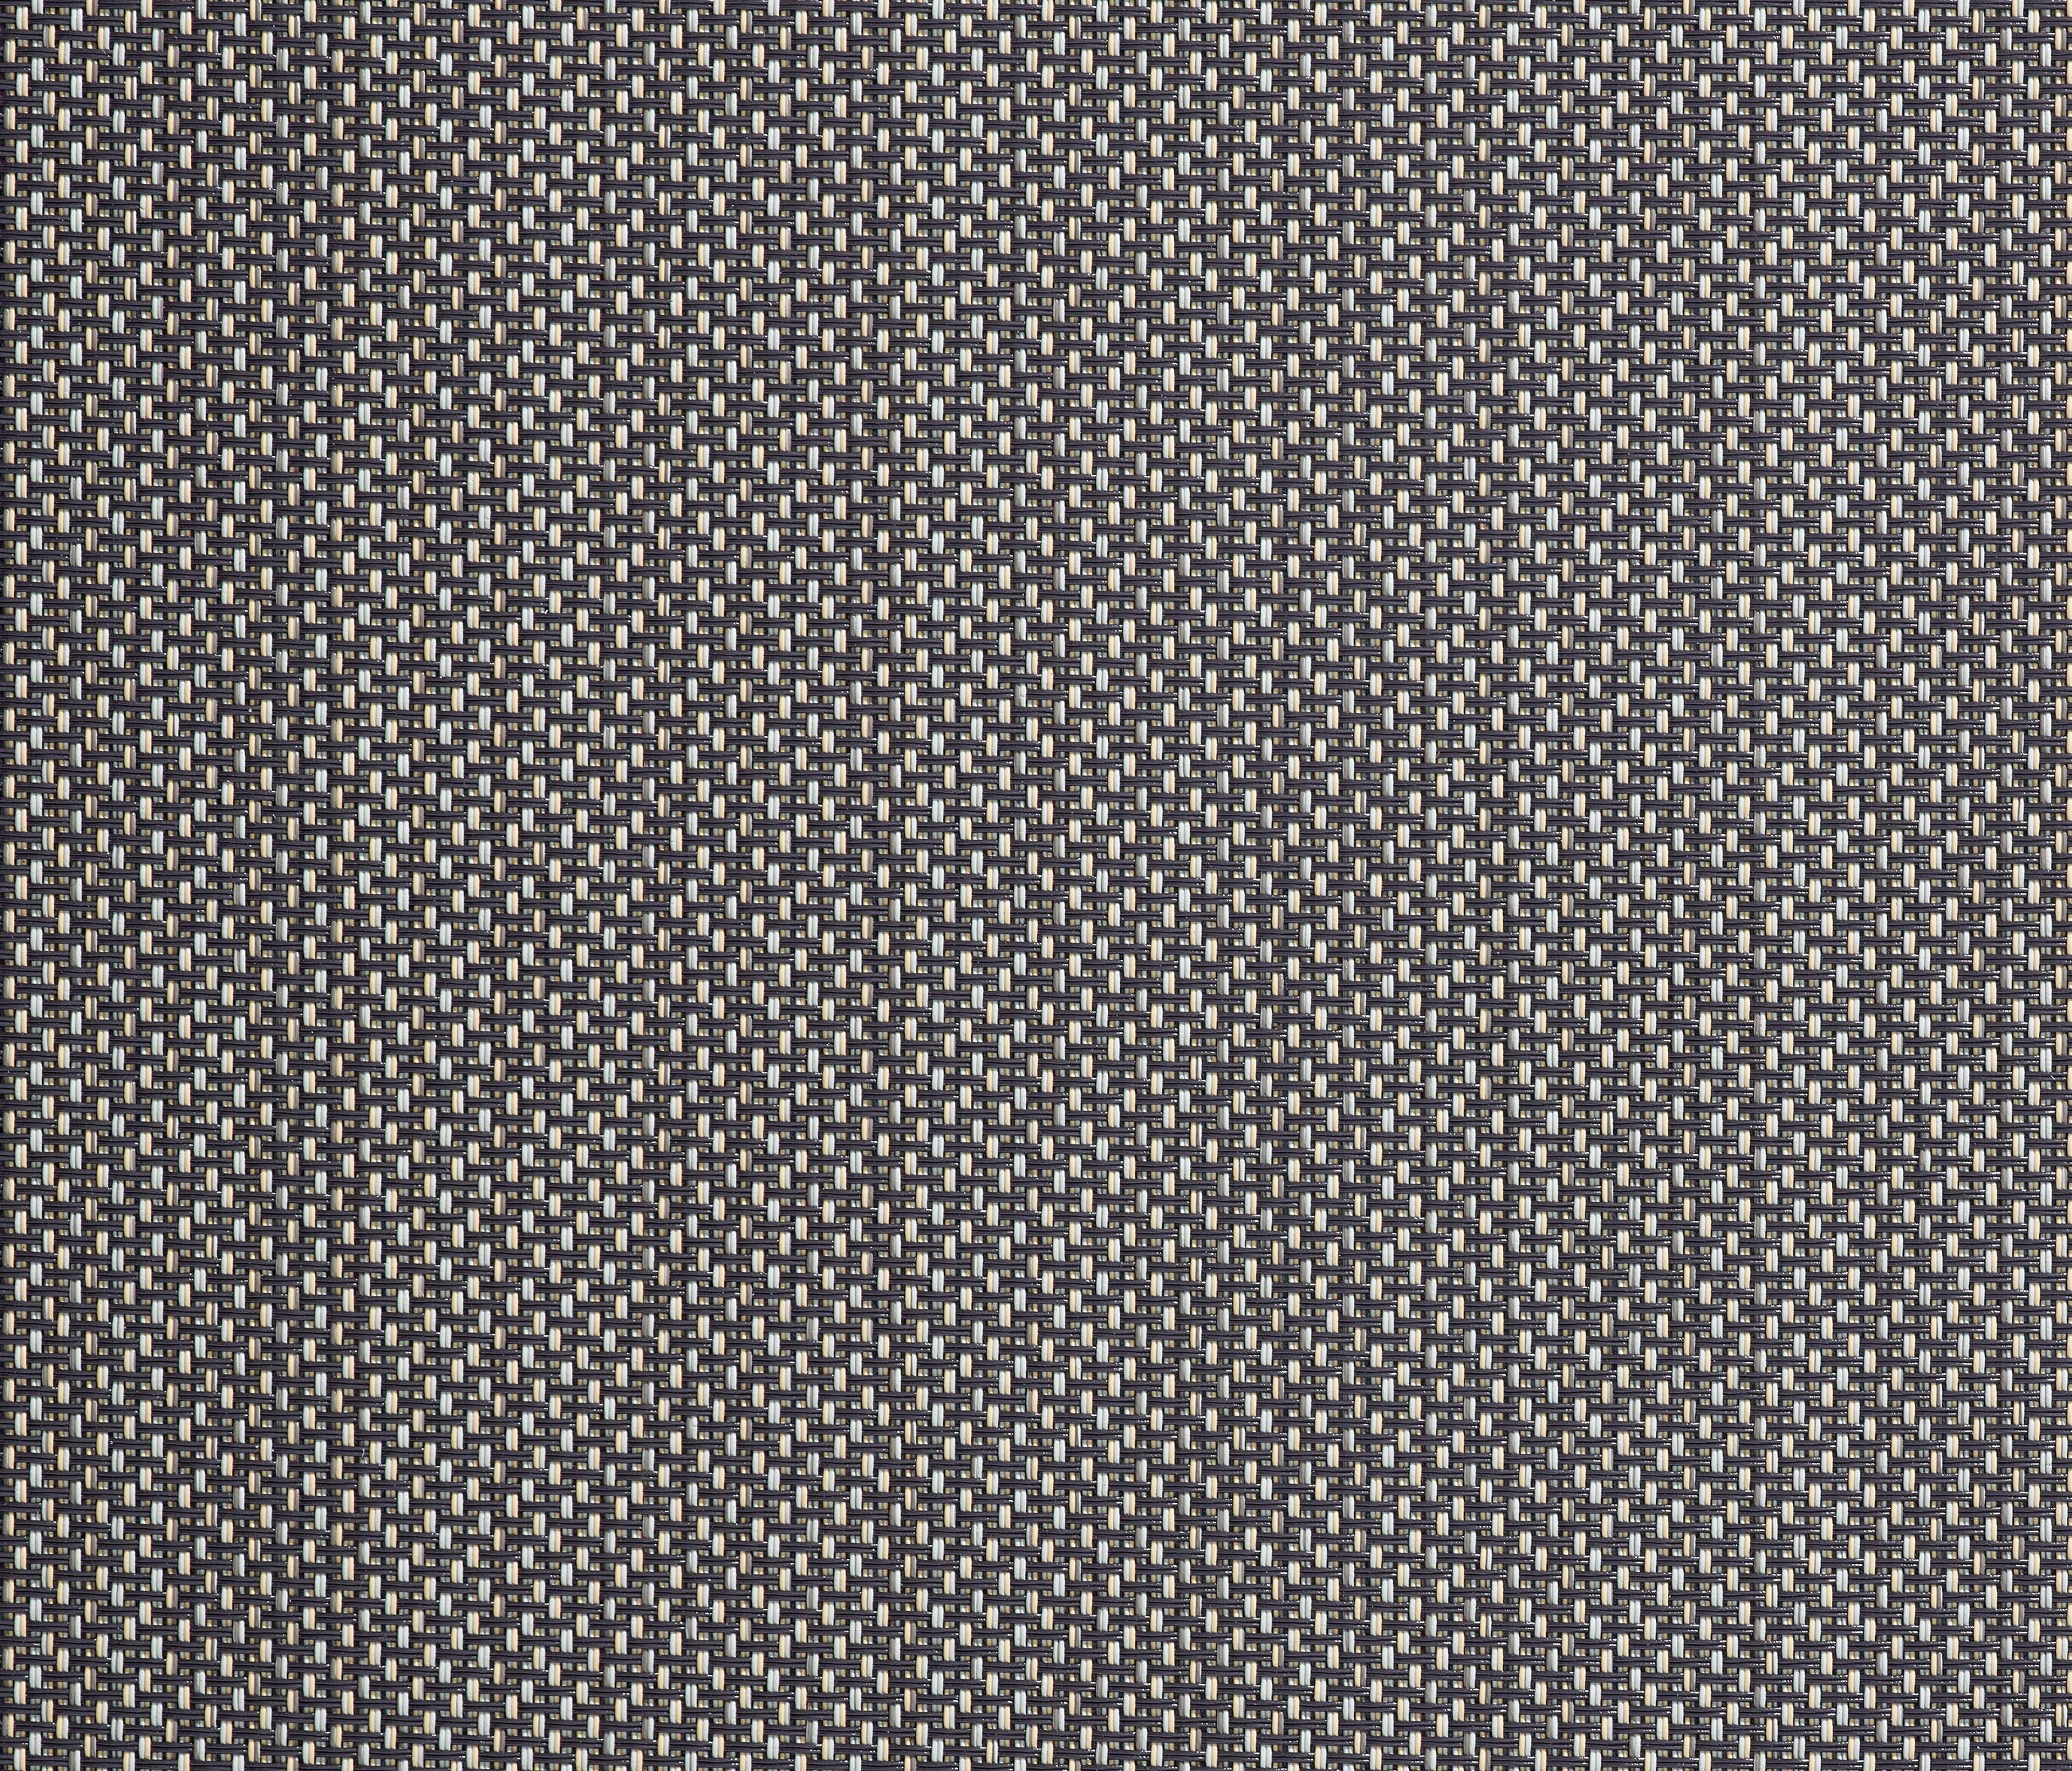 Ntgrate 174 Klic Wabi Sabi Browngrey Synthetic Panels From